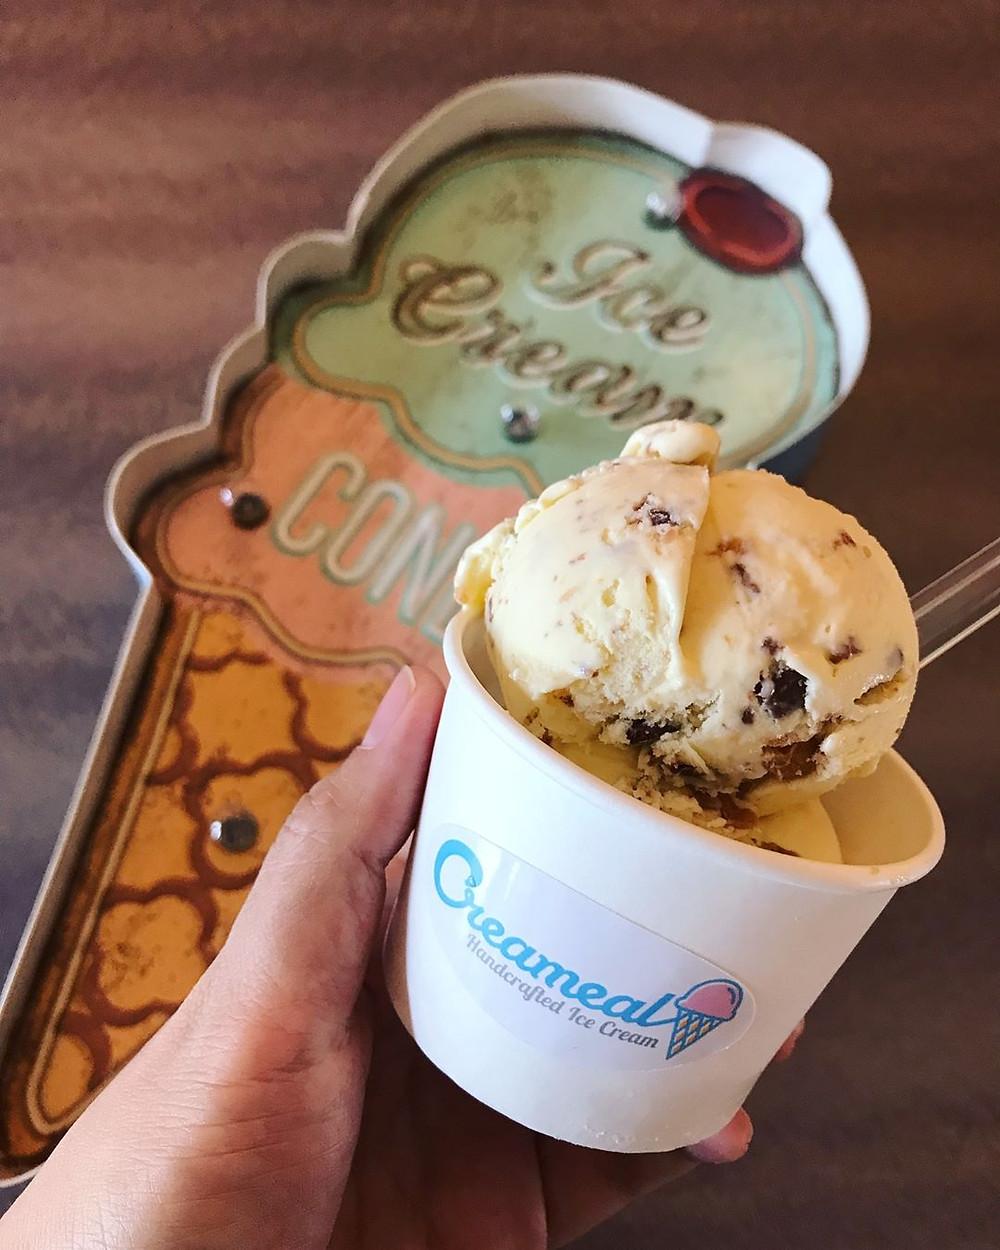 Creameal Handcrafted Ice Cream